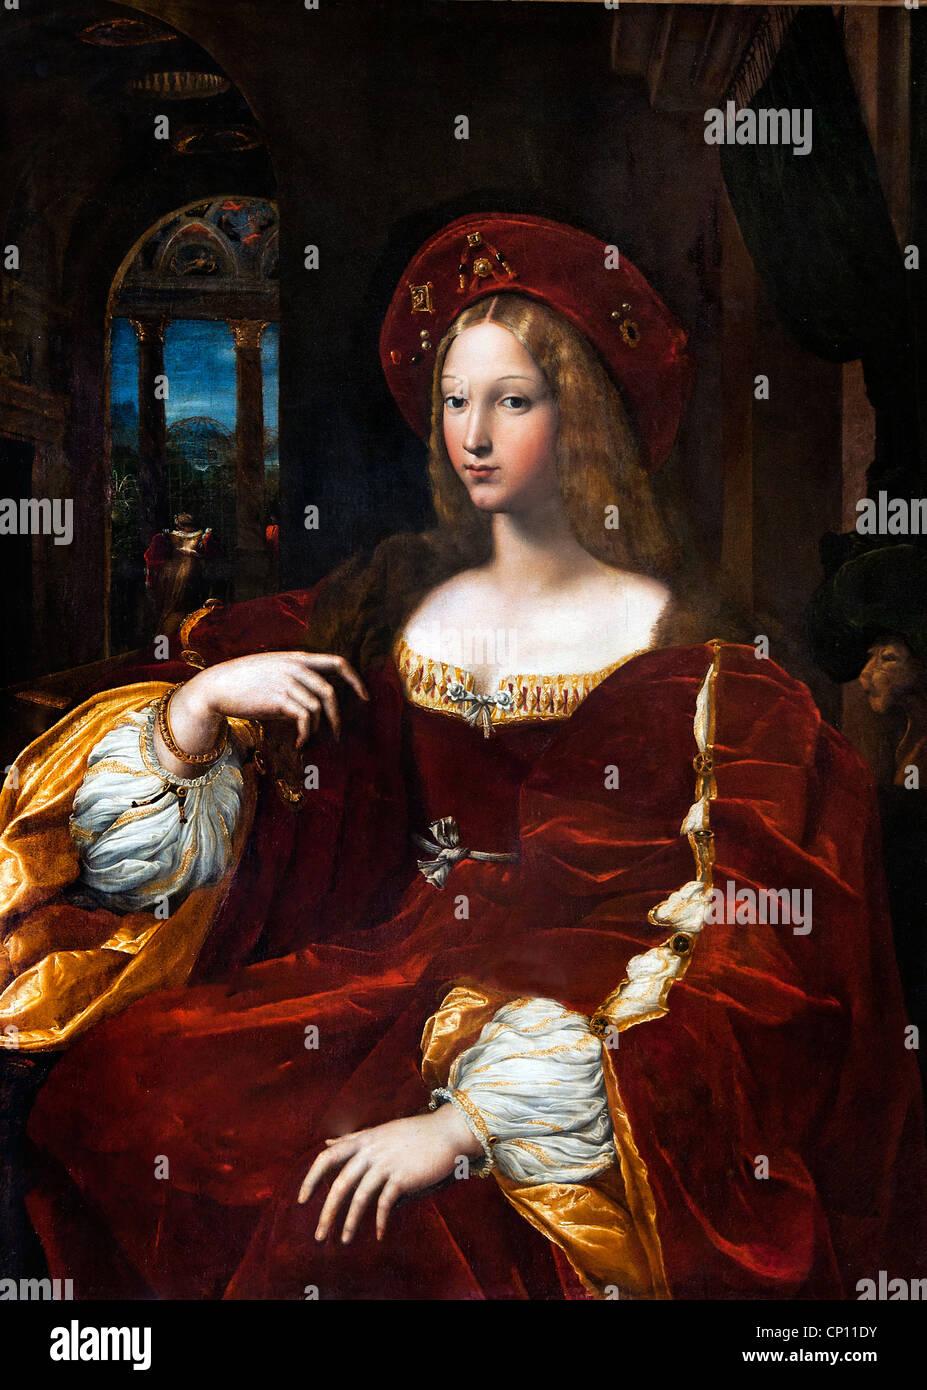 Portrait of Dona Isabel Requesens Vice Queen of Naples  by Raffaello Santi - Raphael 1483 - 1520 and Guilio Pippi - Stock Image